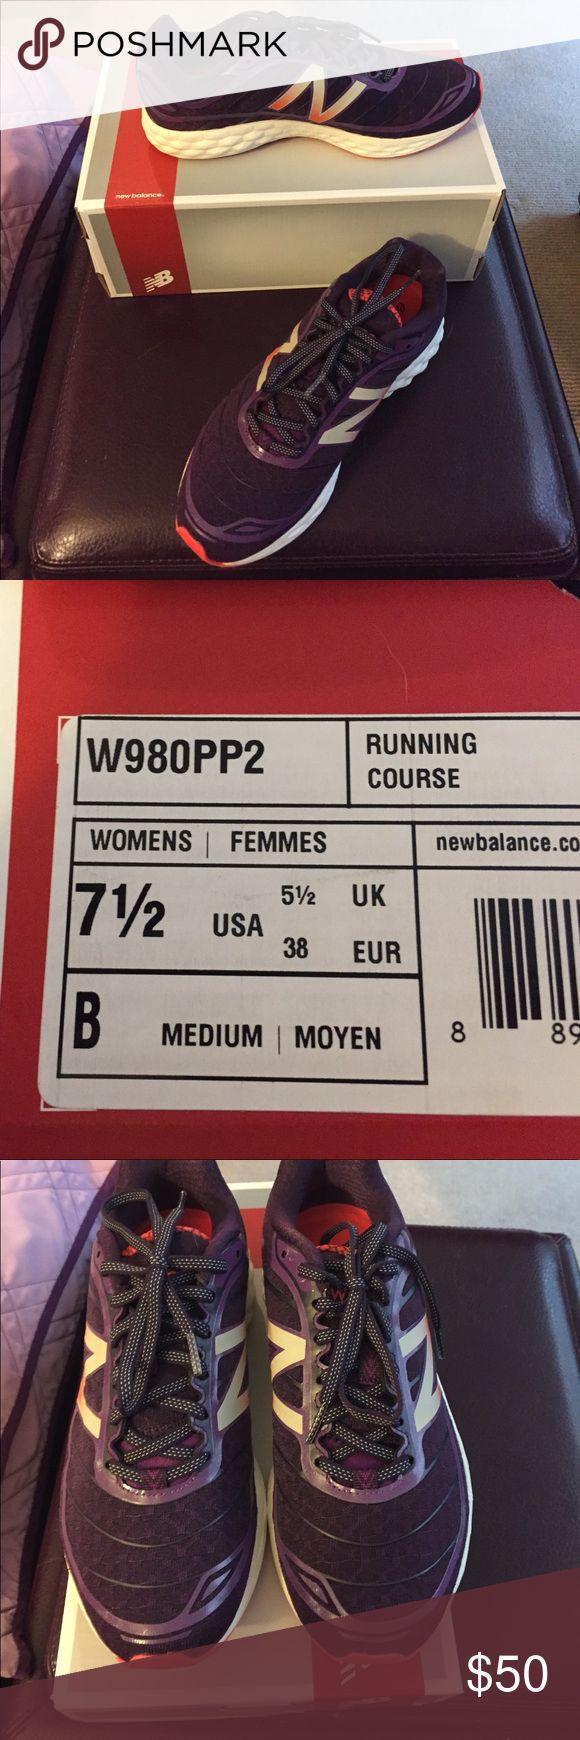 Brand new New Balance fresh foam running shoe! Women's 7 1/2 NEW BALANCE fresh foam running shoes. Never worn New Balance Shoes Sneakers